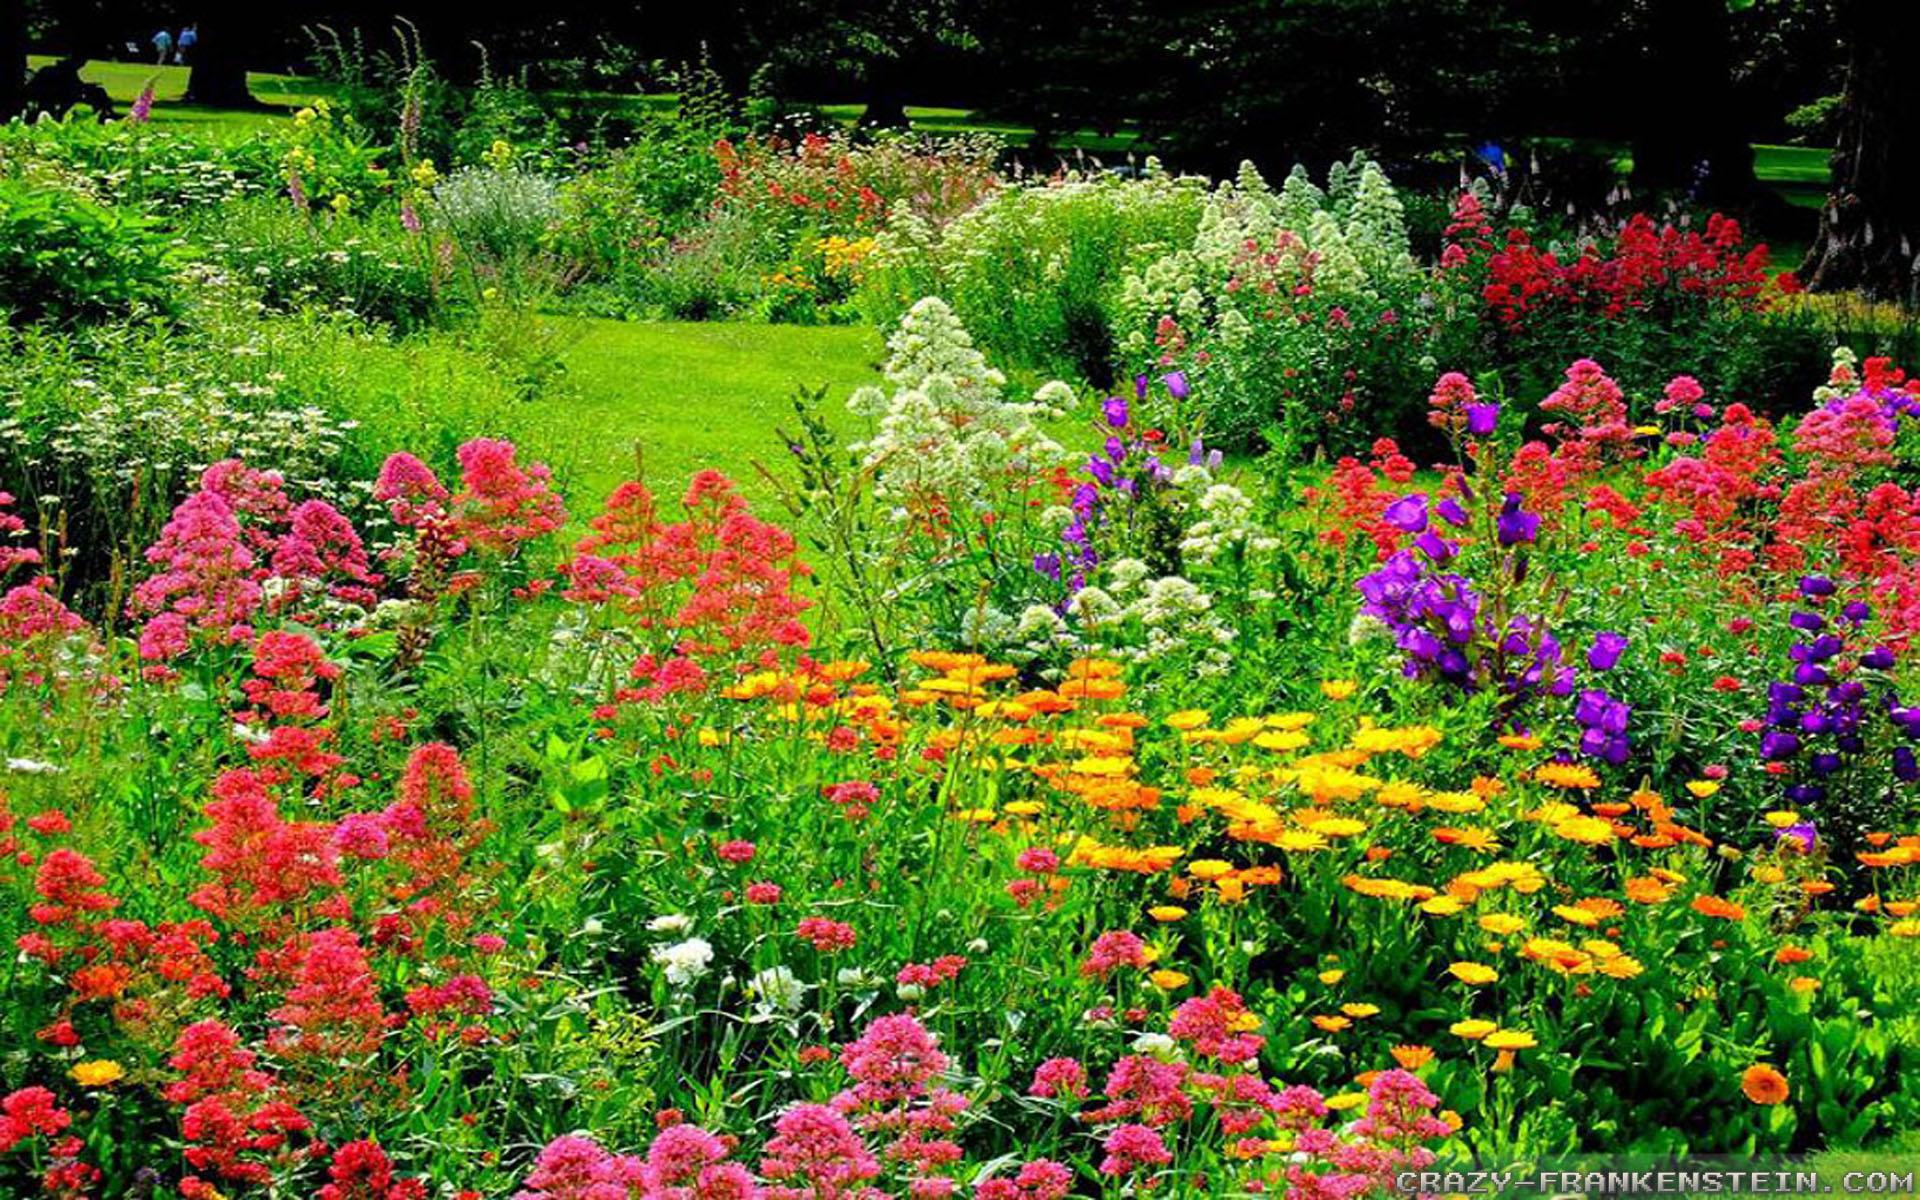 Beautiful Flower Garden Wallpapers - WallpaperSafari